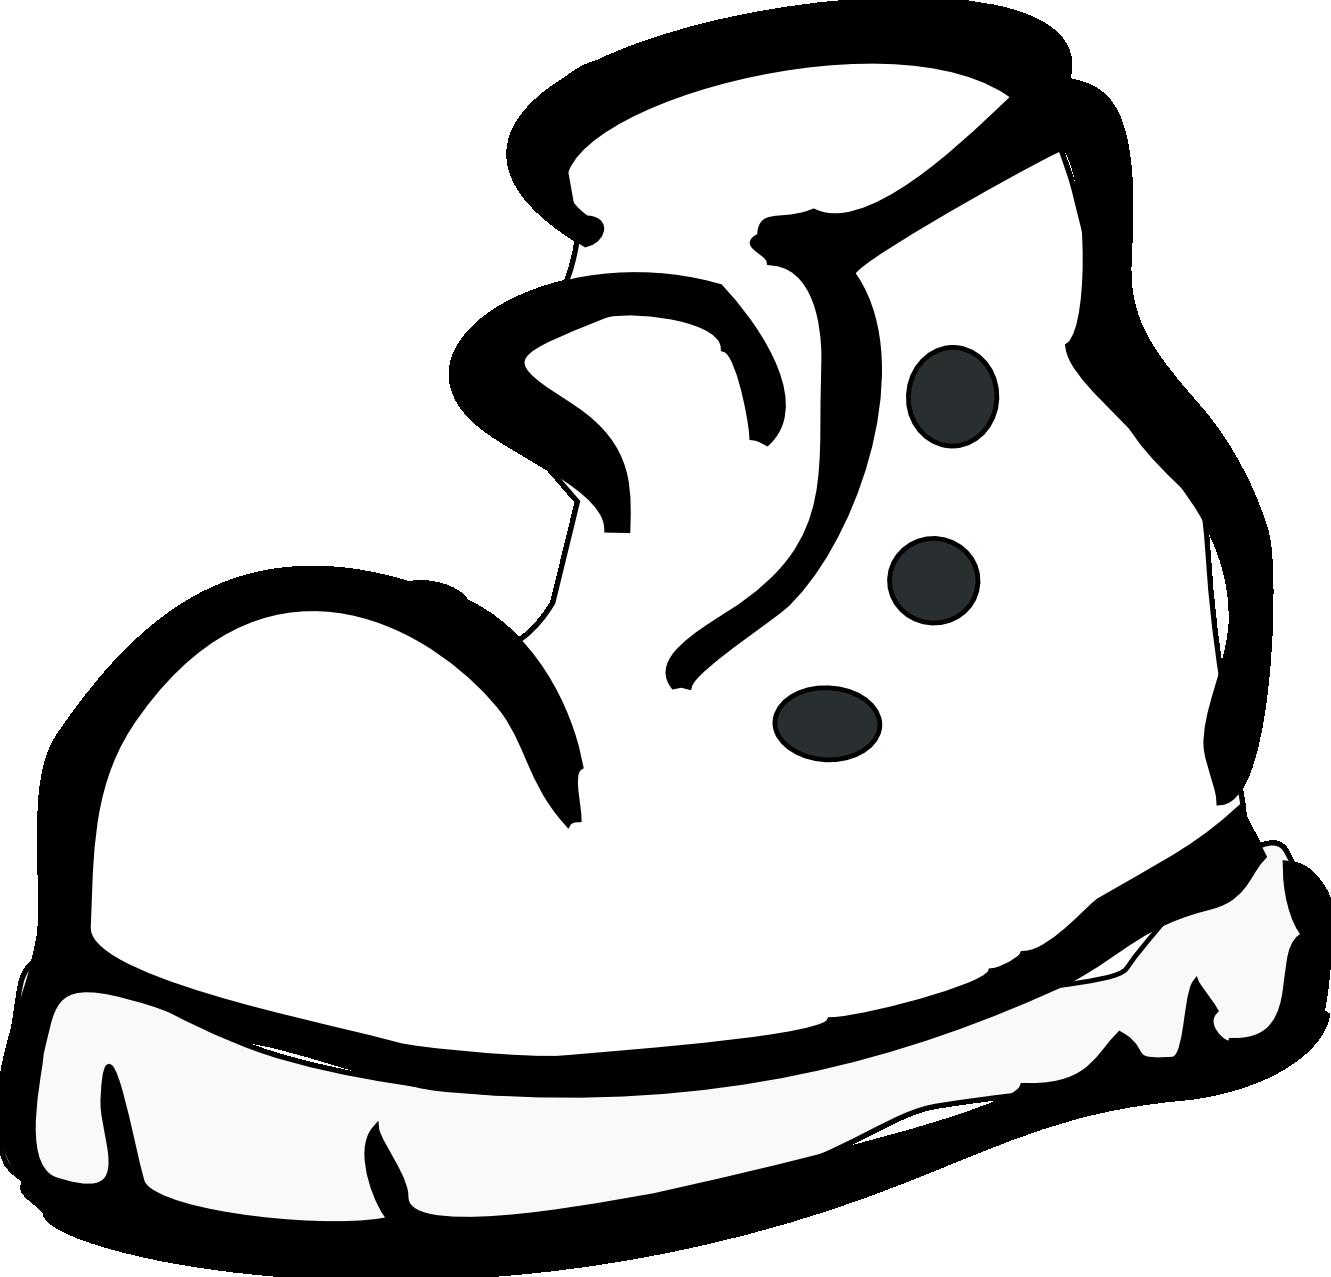 1331x1277 Shoe Outline